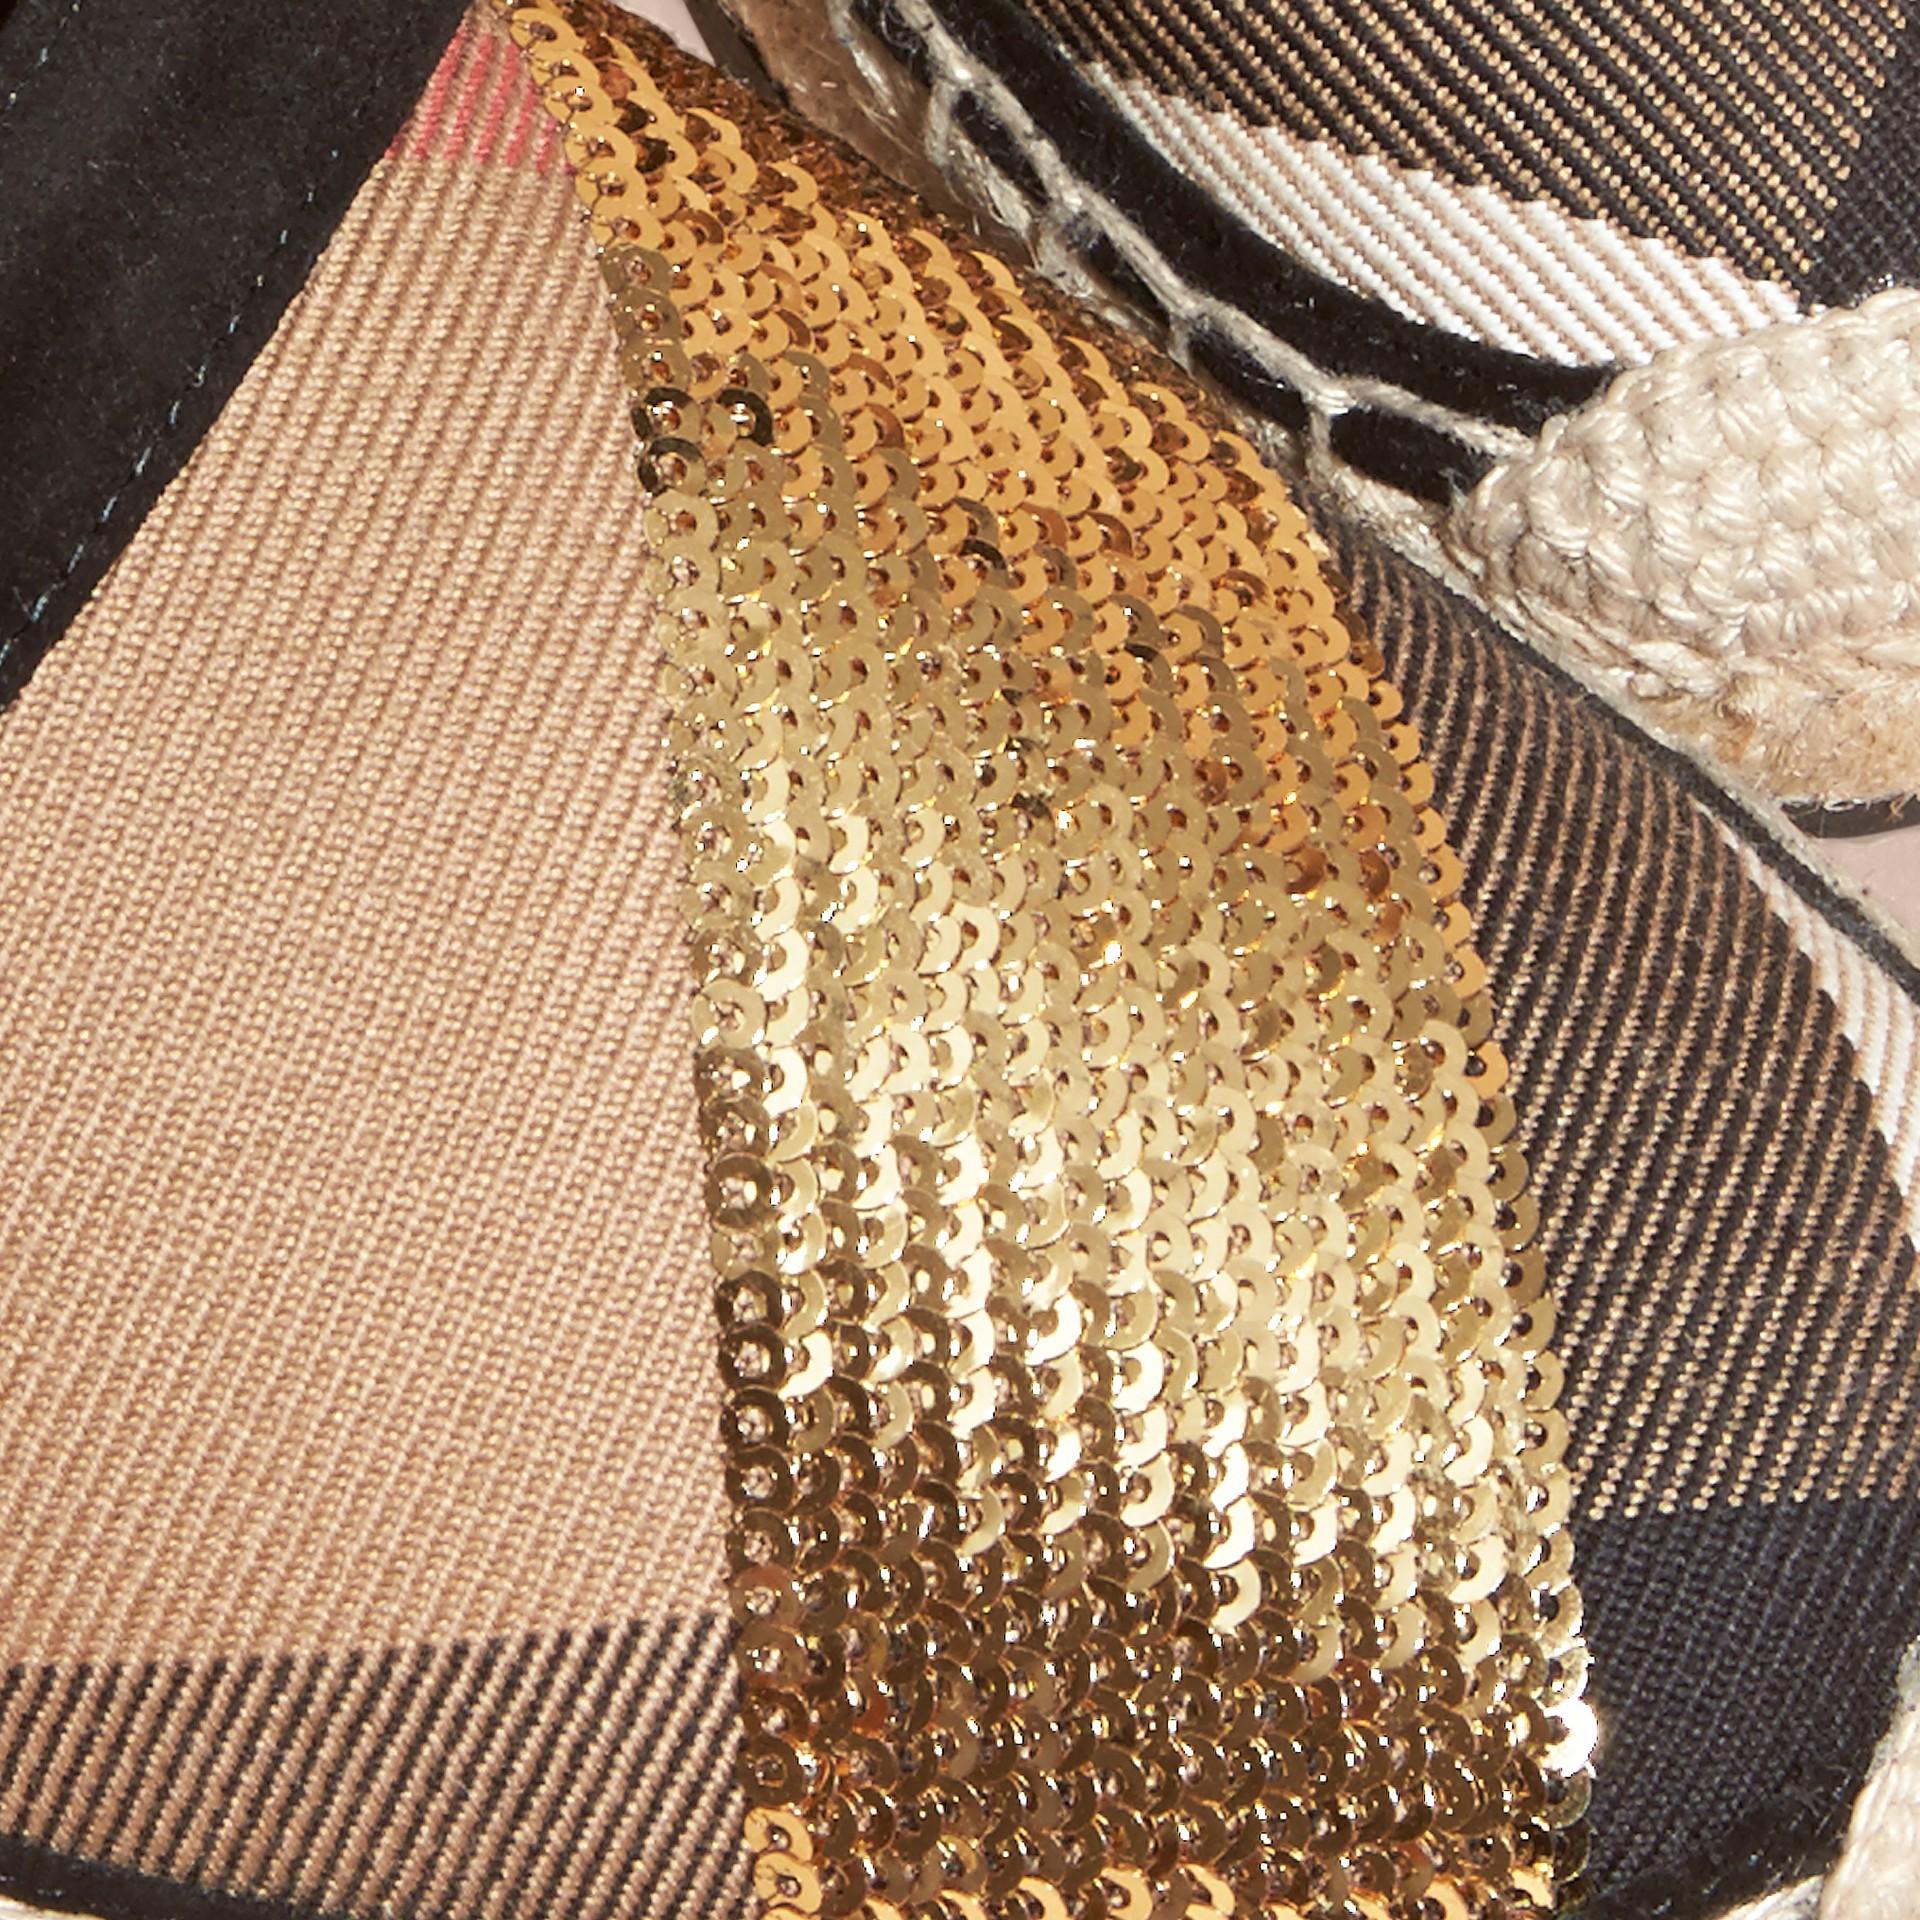 House 格紋/金色 亮片皮革拼 House 格紋麻織涼鞋 格紋/金色 - 圖庫照片 2